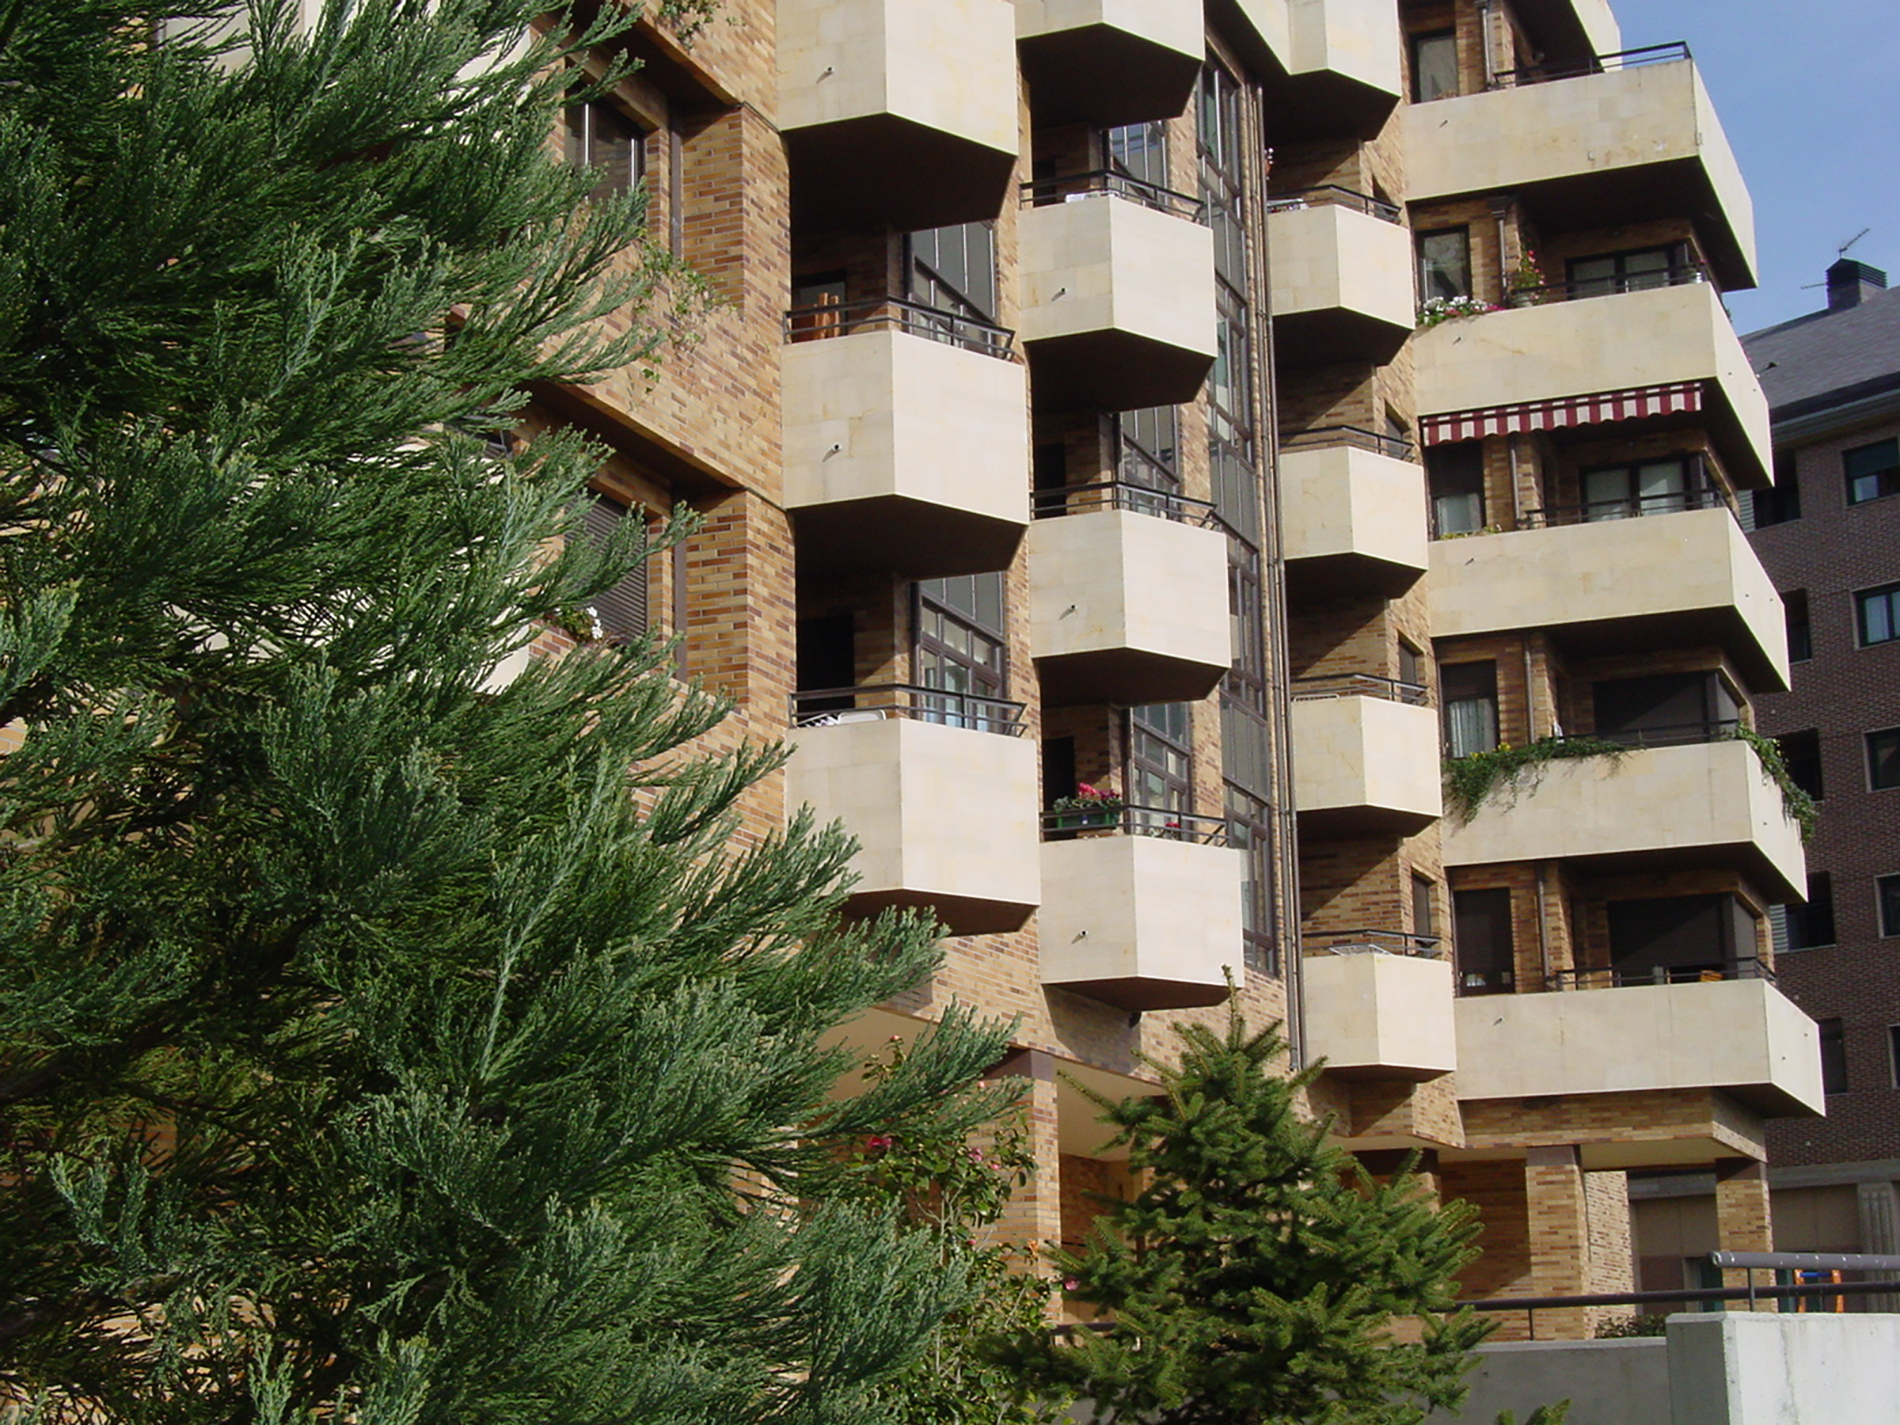 jardines del aramo asturias 2